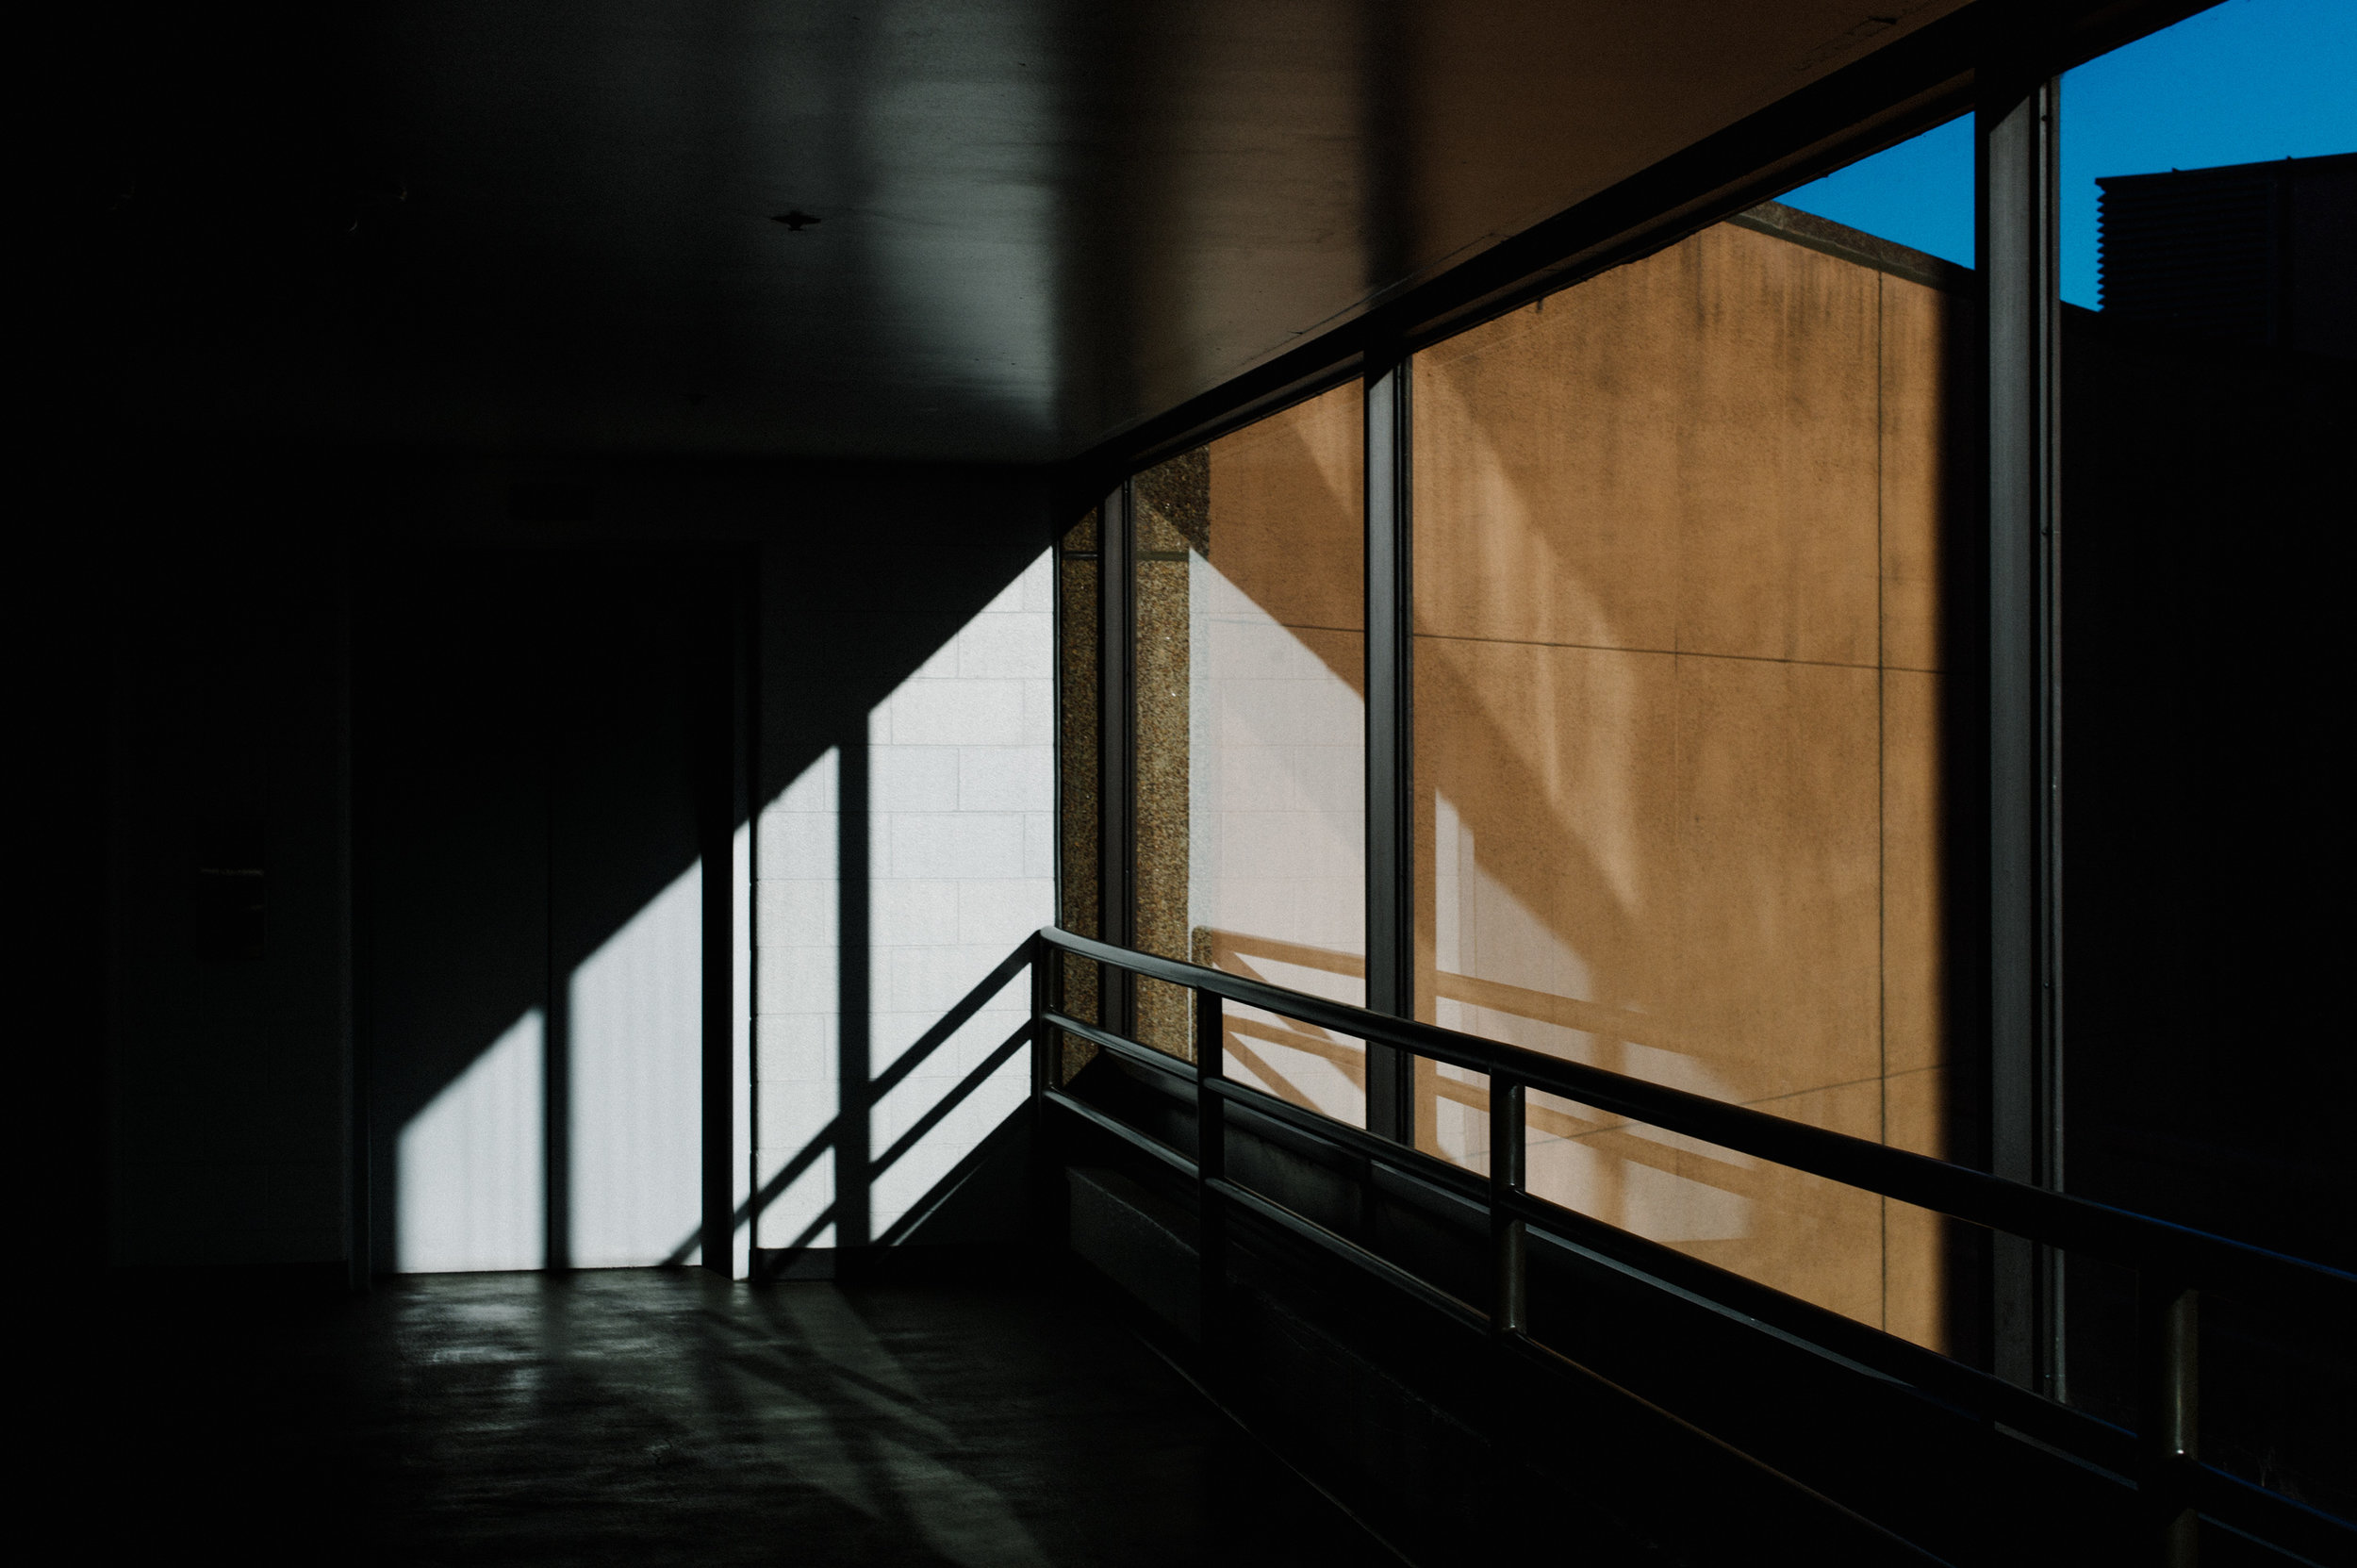 The 8th floor, Denver